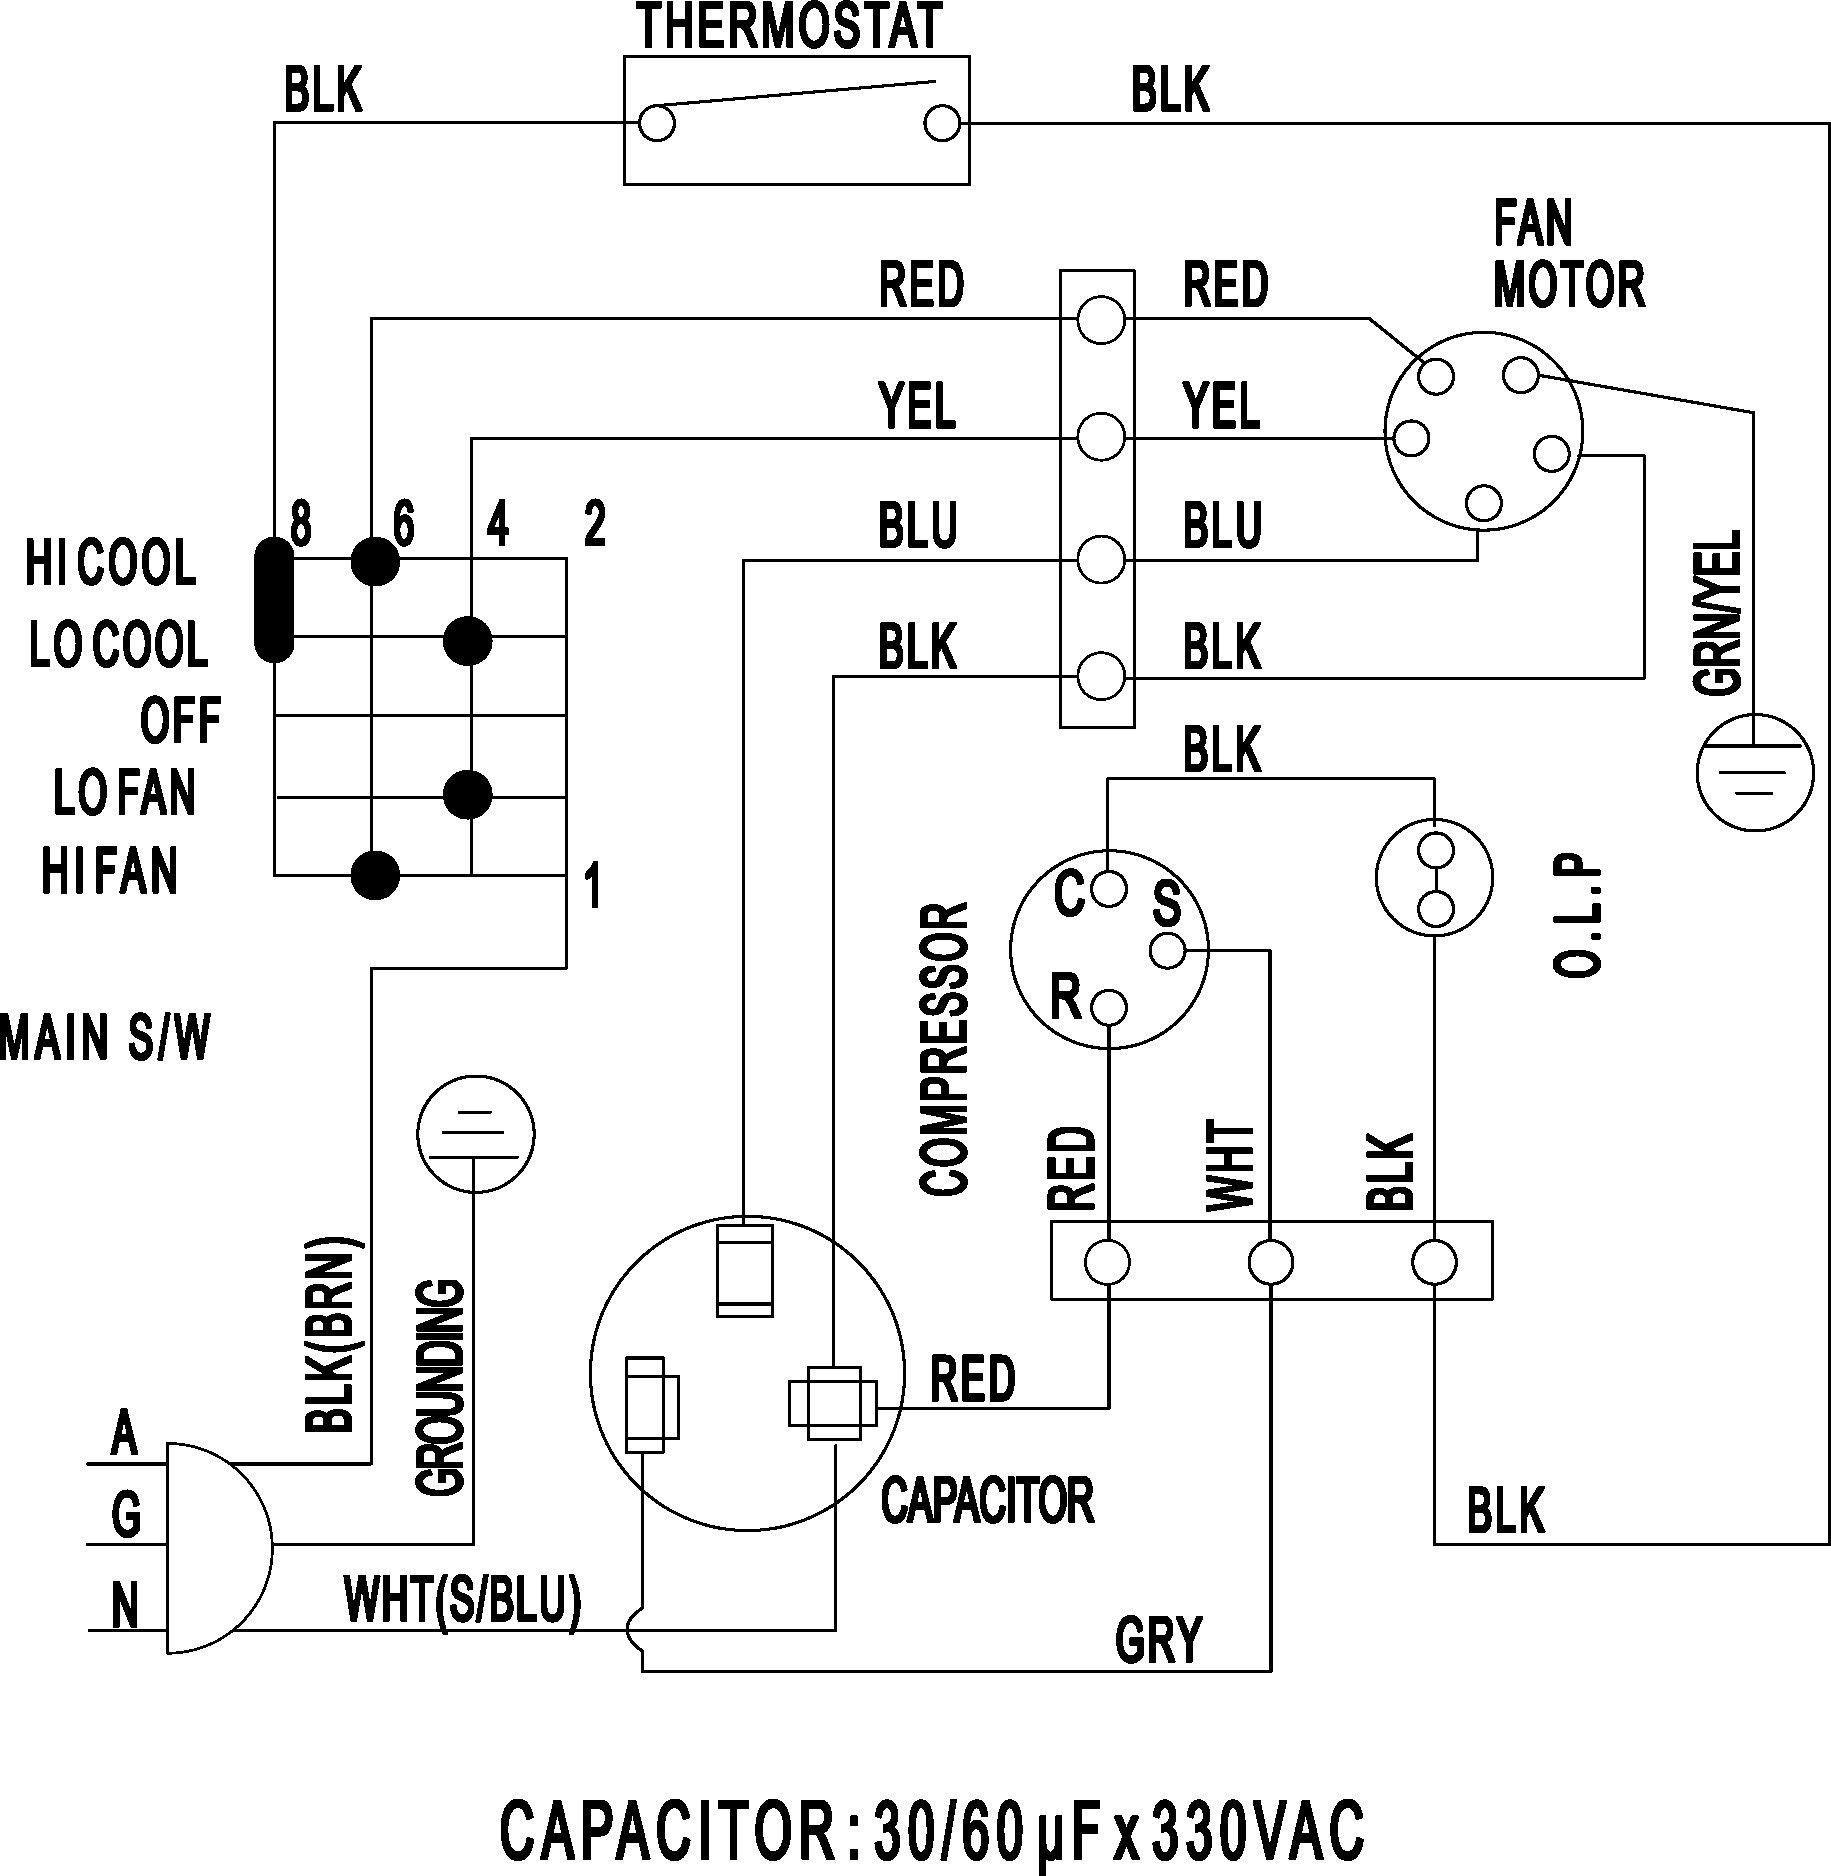 murray 405000x8 wiring diagram kd 0186  murray 405000x8 wiring diagram wiring diagram  murray 405000x8 wiring diagram wiring